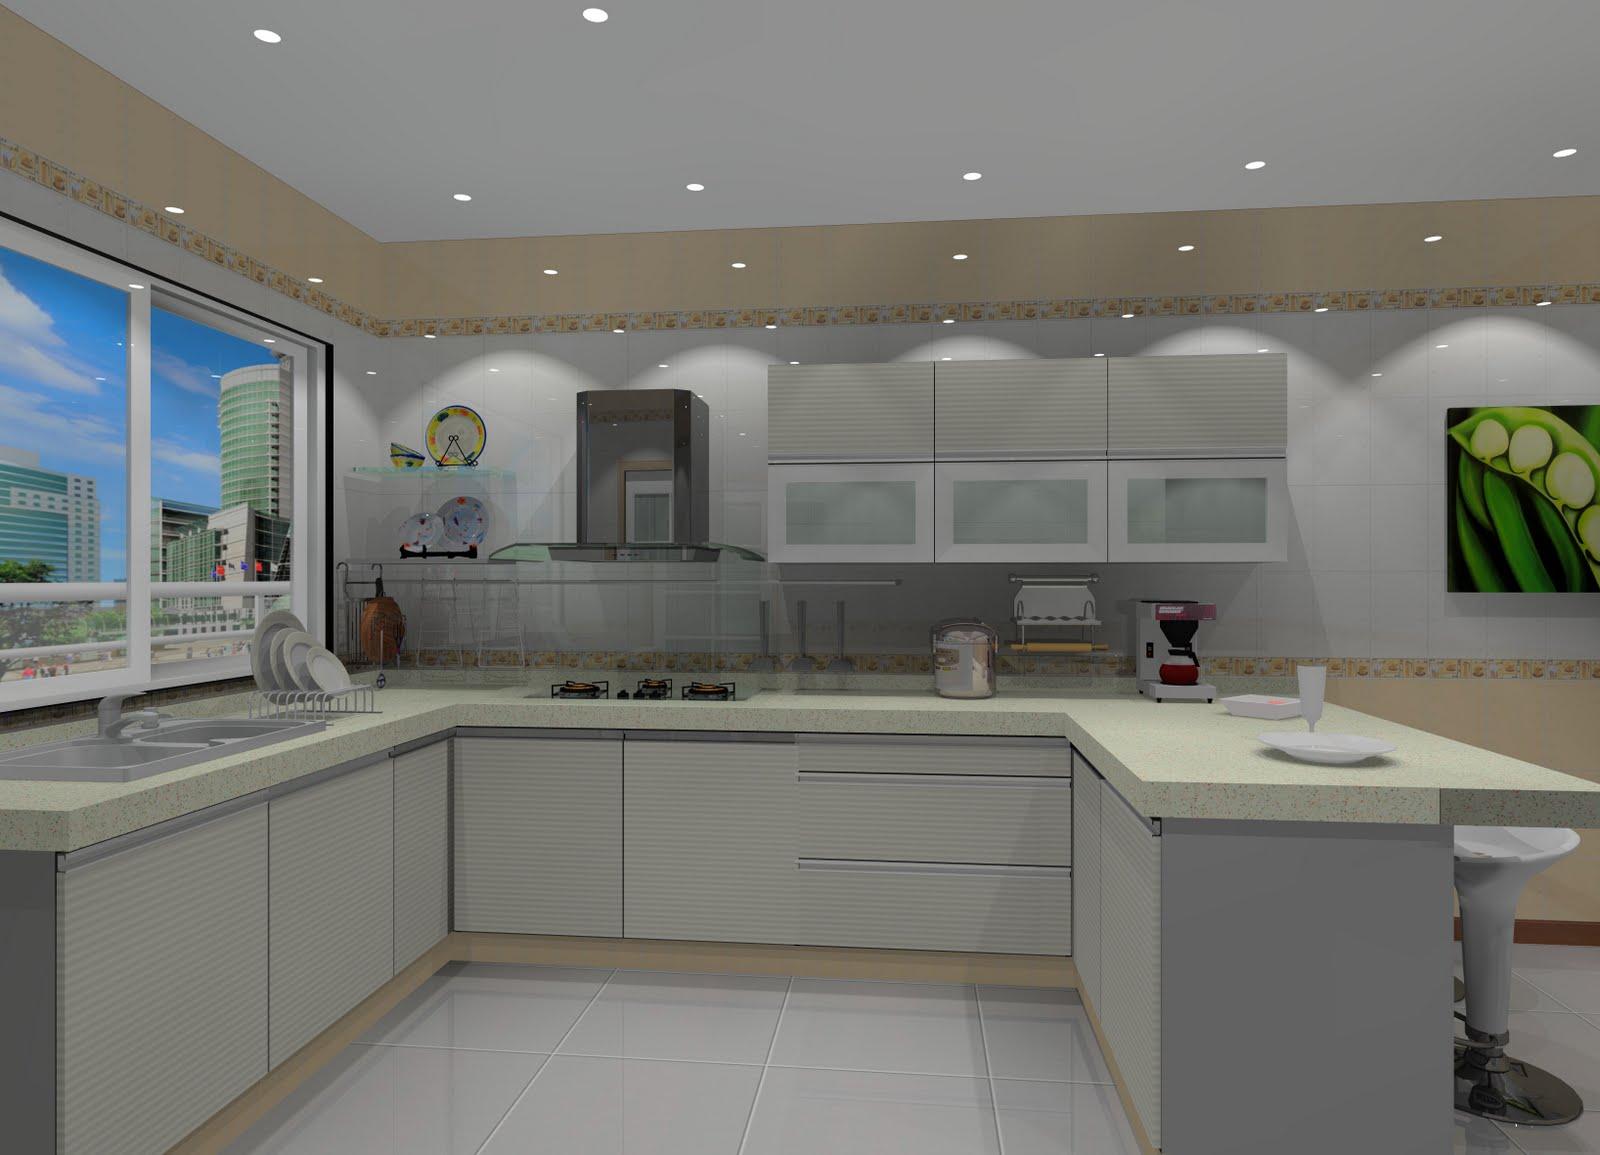 Talco design kitchen cabinet design type for A z kitchen cabinets ltd calgary